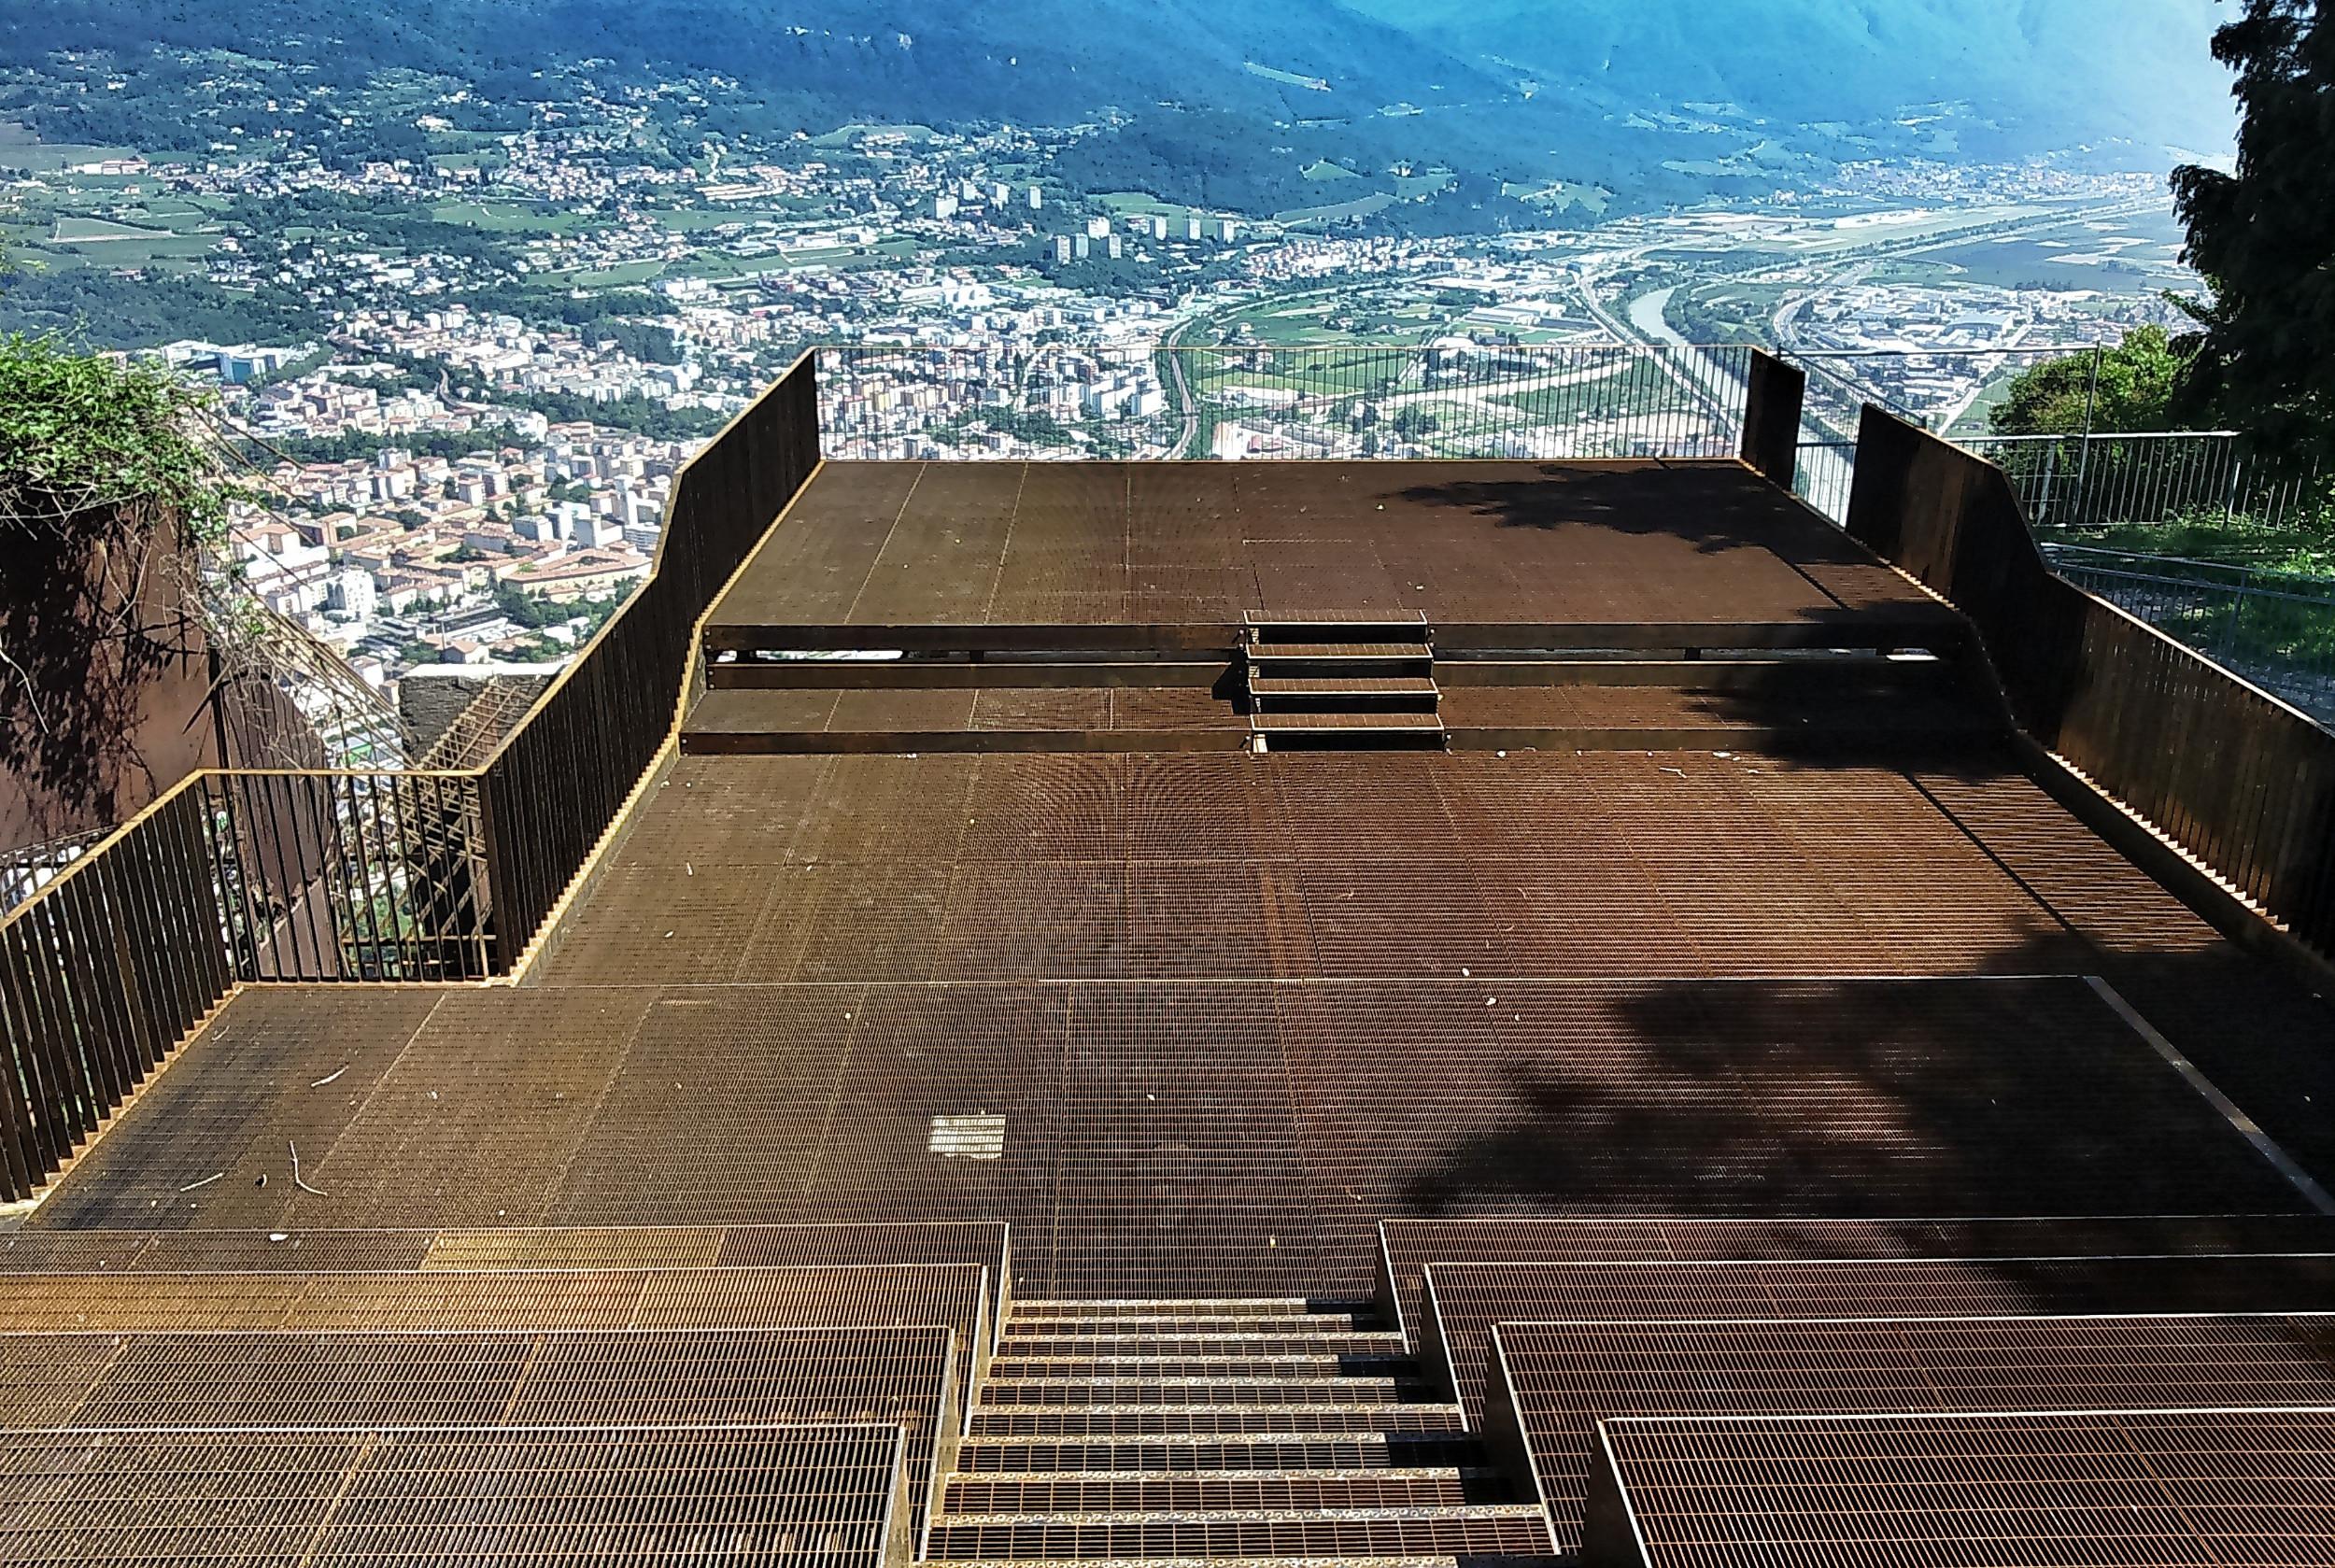 You are currently viewing Nuovo punto panoramico a Sardagna: il M5s rimane perplesso sulle scelte prese